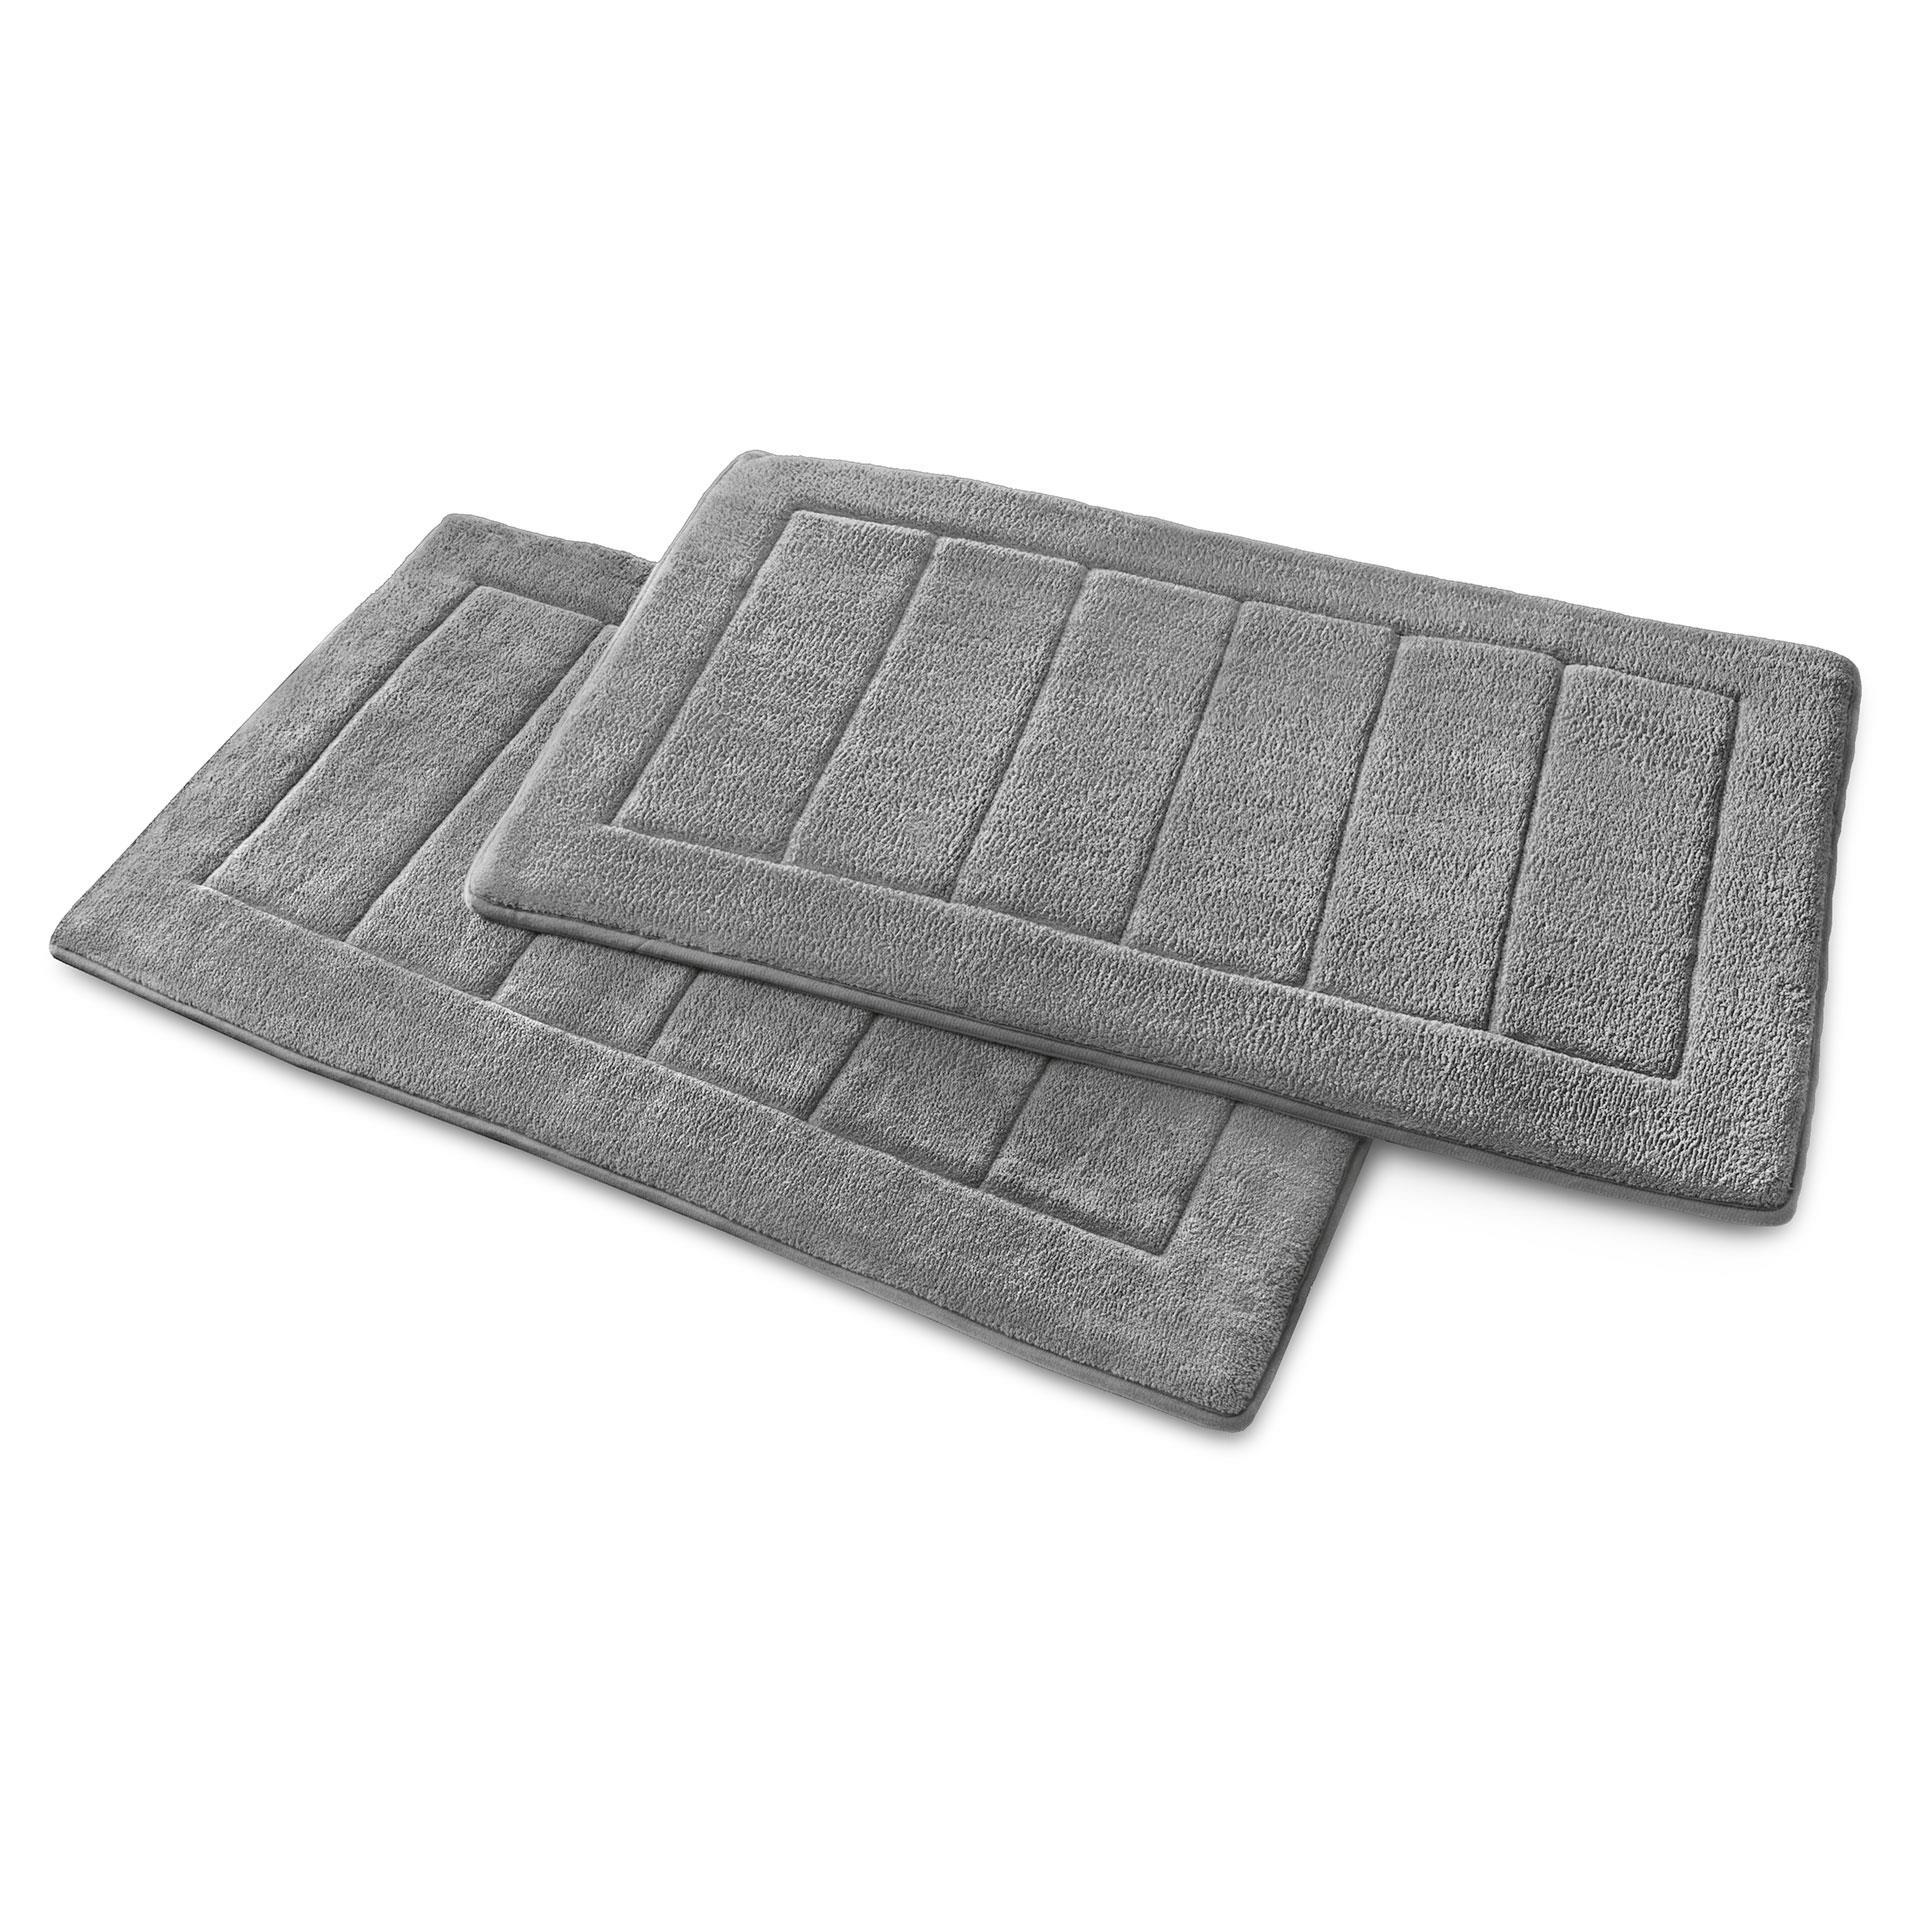 Memory-Foam Badezimmerteppich grau